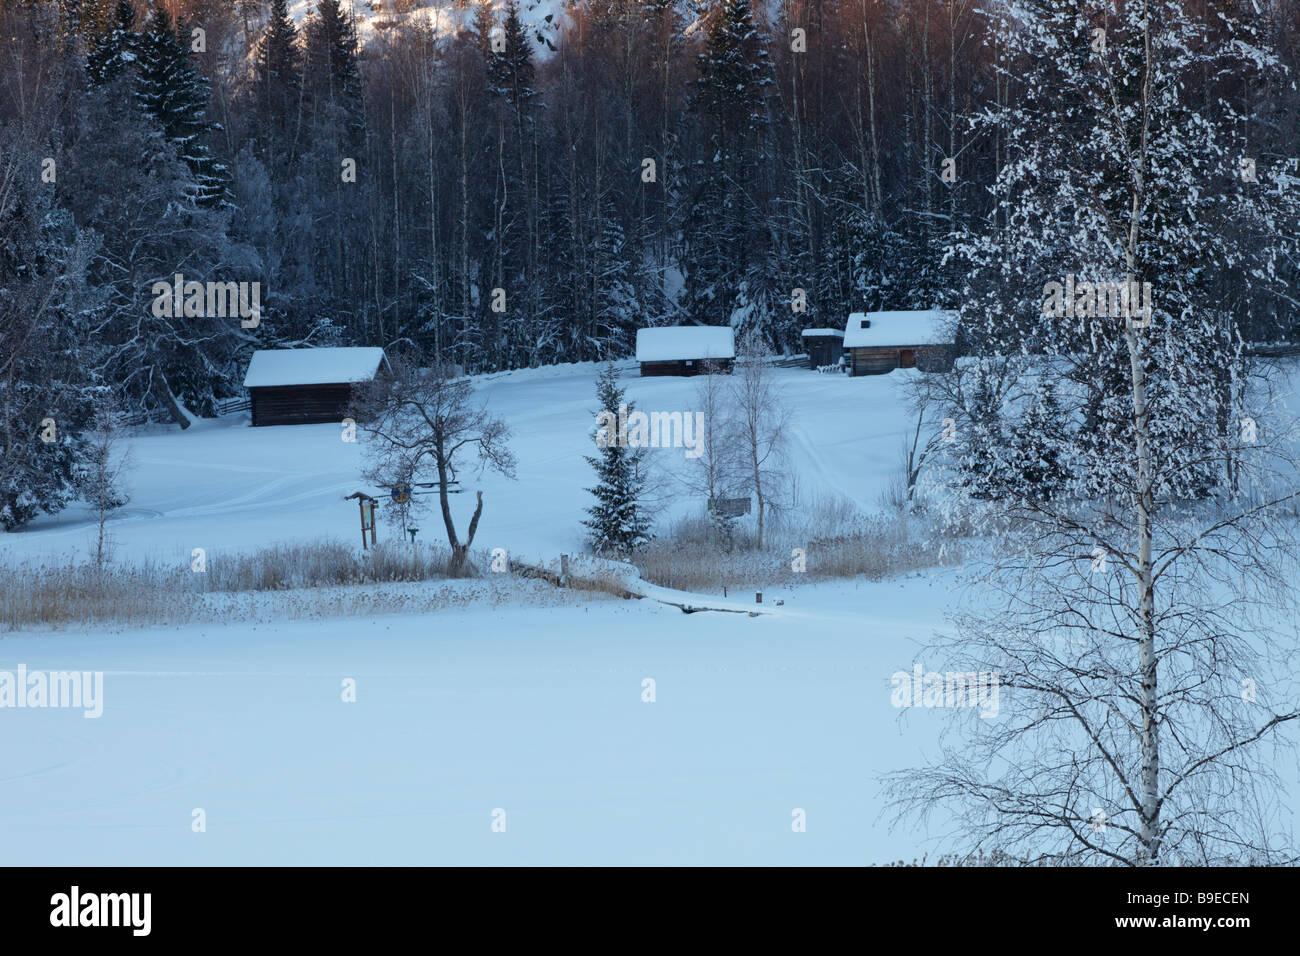 Farm-houses in winter. Rural landscape in the UNESCO World Heritage area Hoega Kusten / High Coast in Sweden - Stock Image